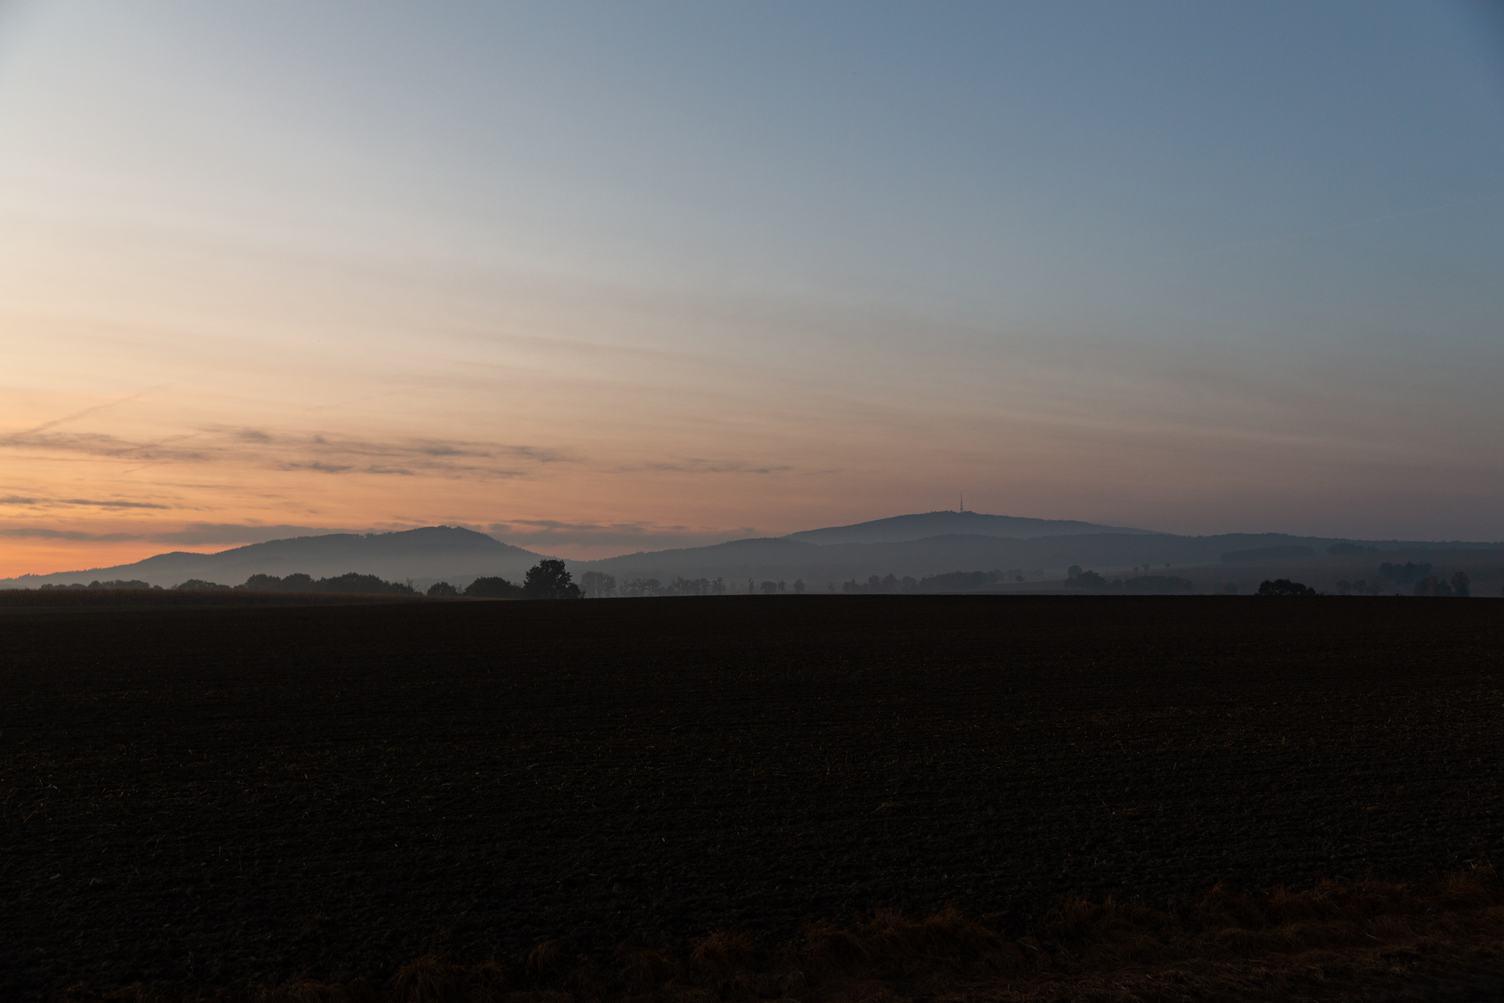 Mountain Landscape after Sunset